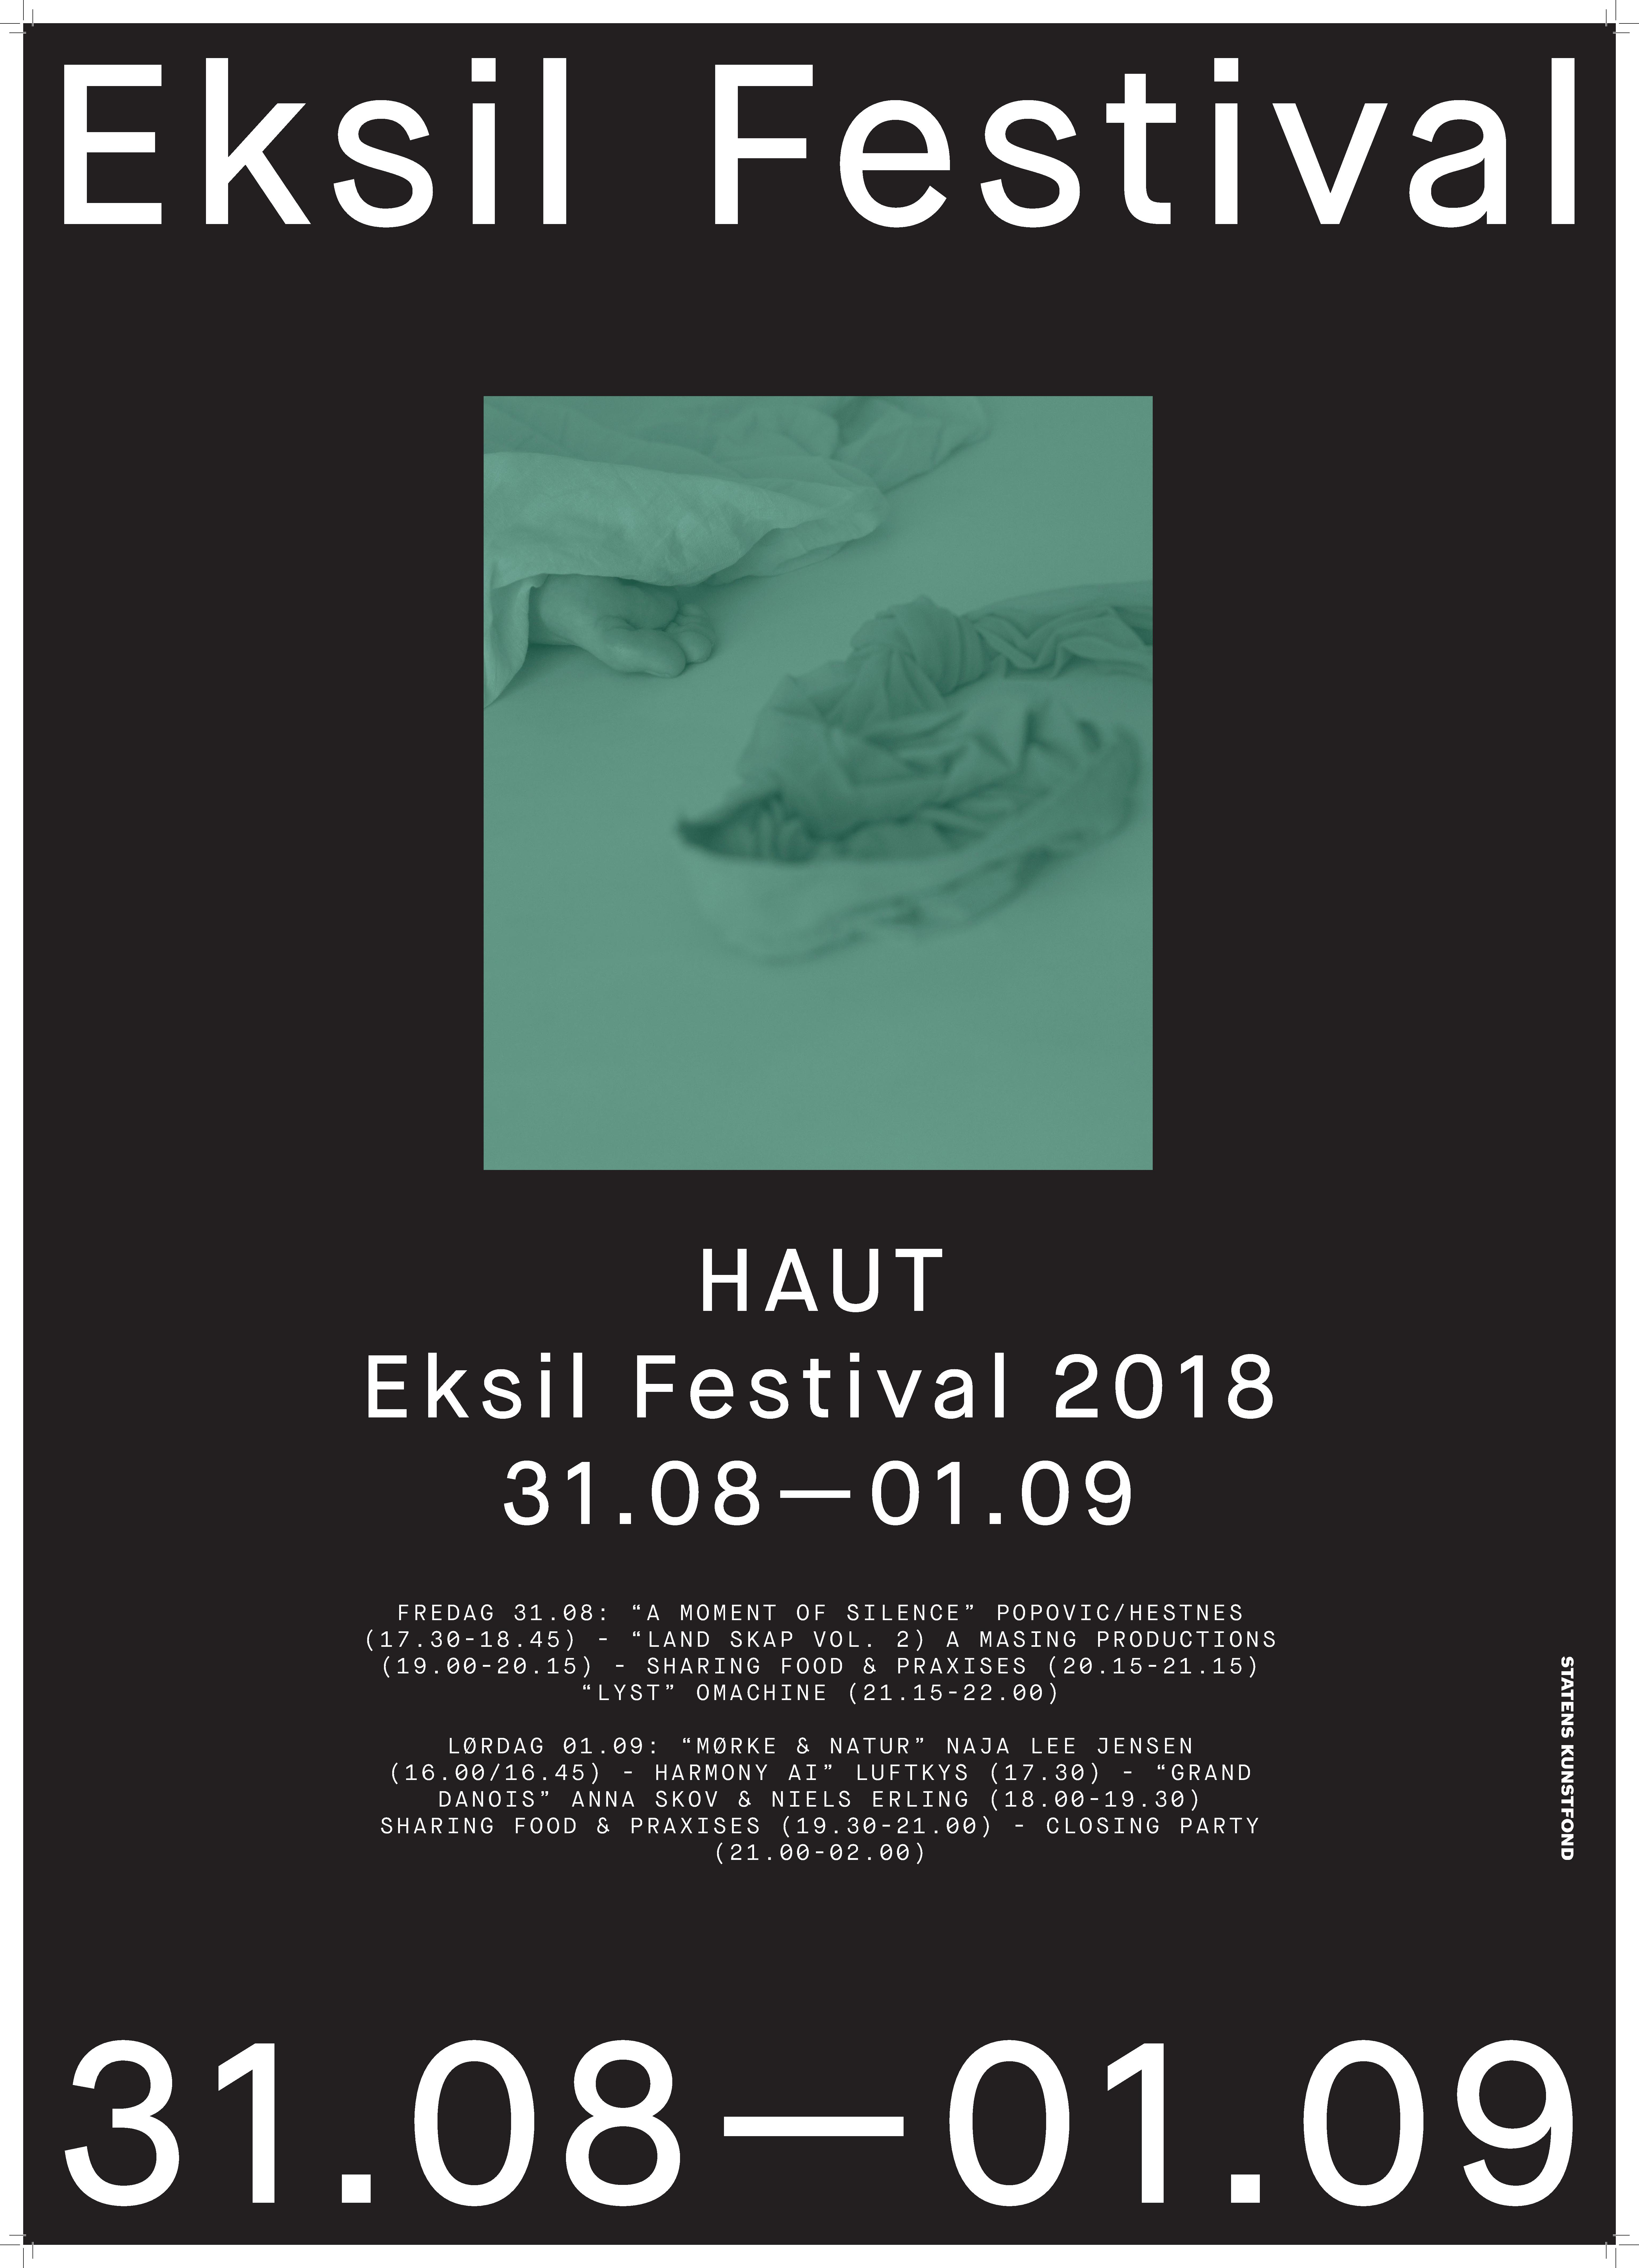 Eksilfestival